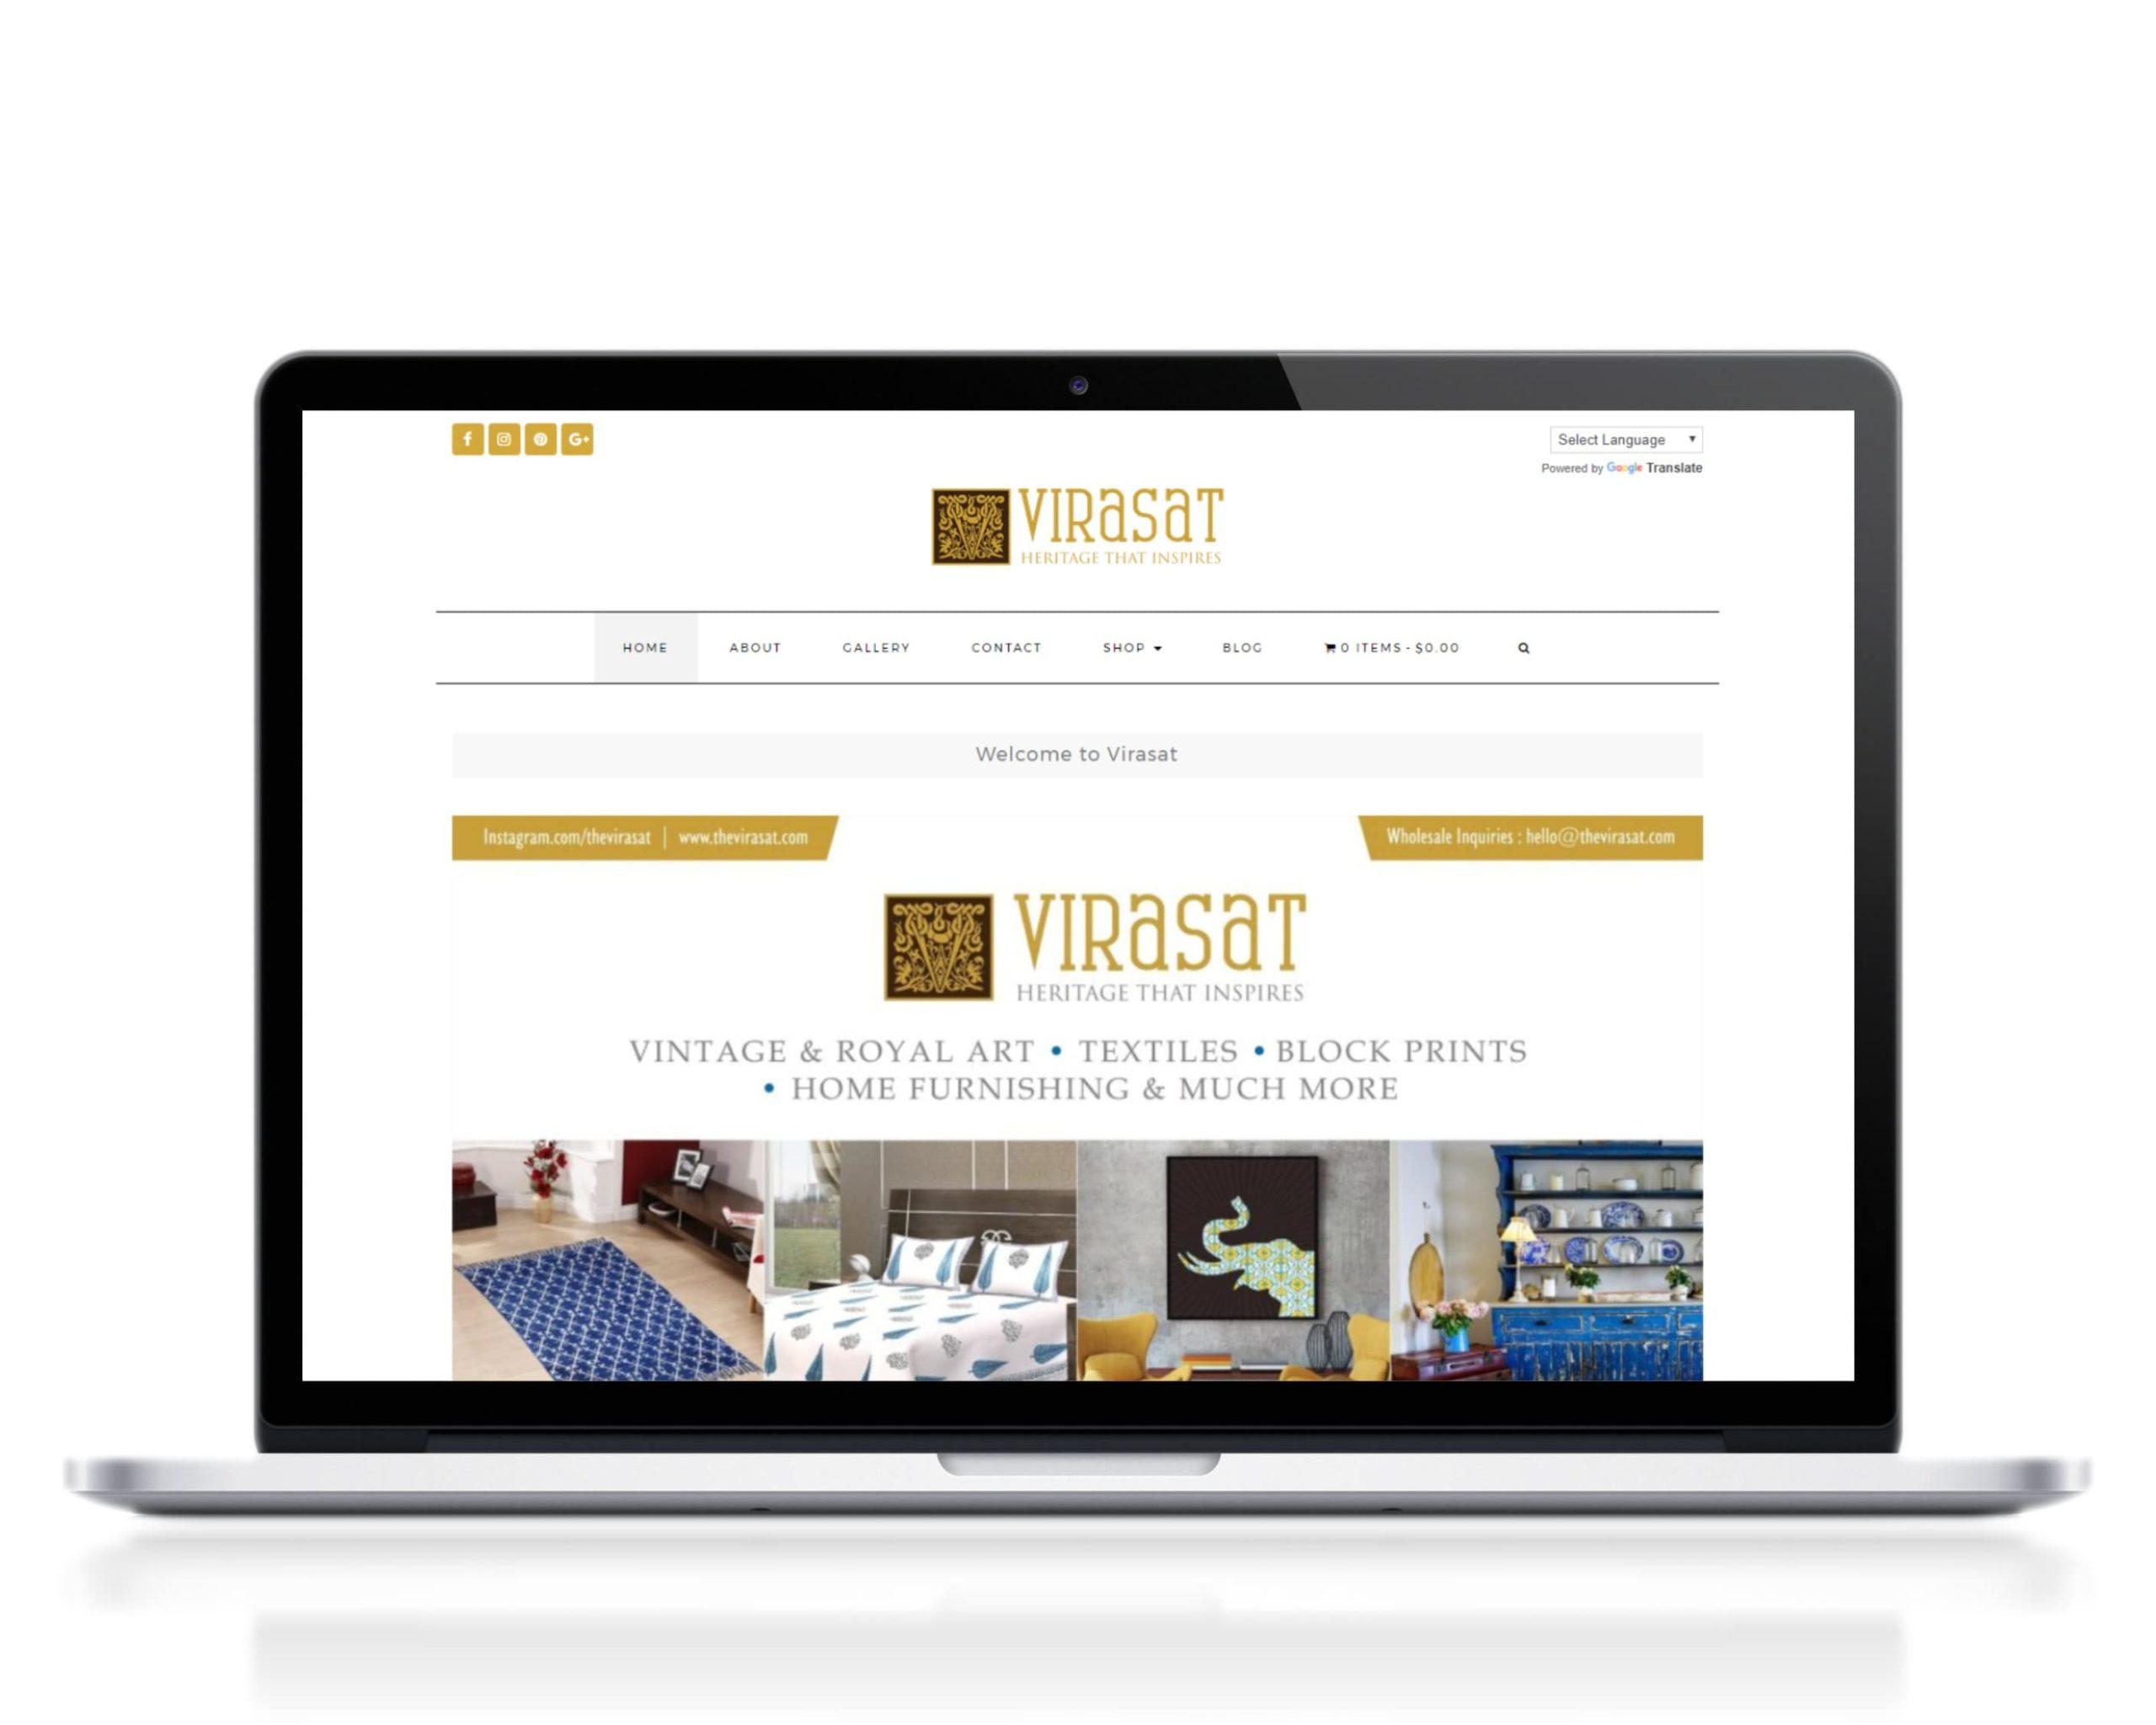 Virasat-website